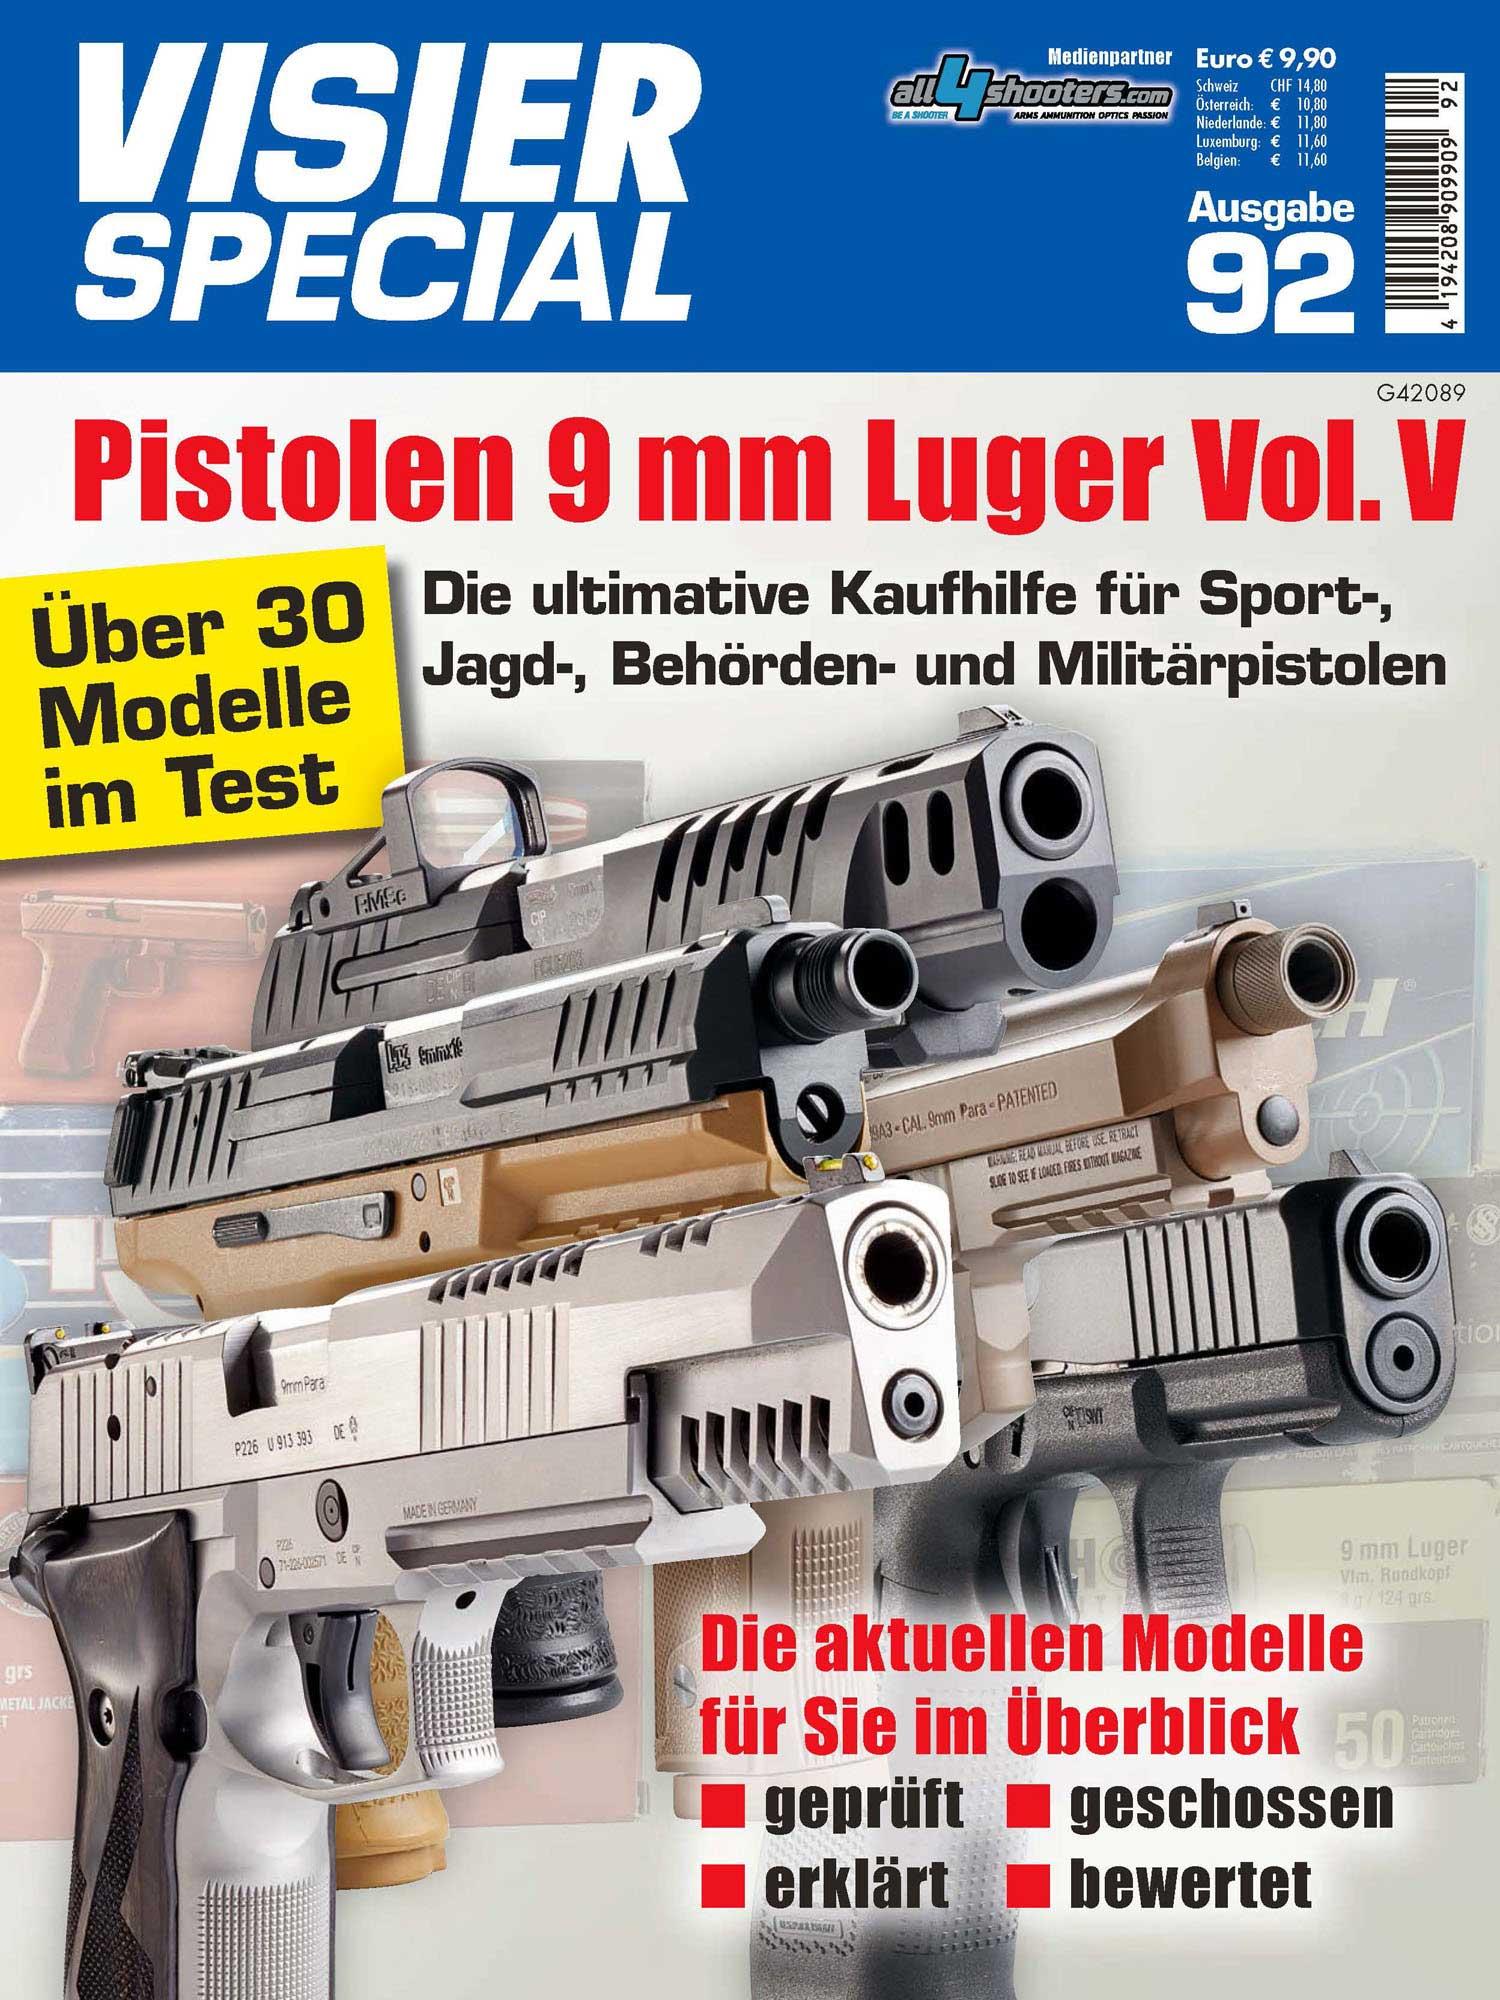 VISIER Special 92